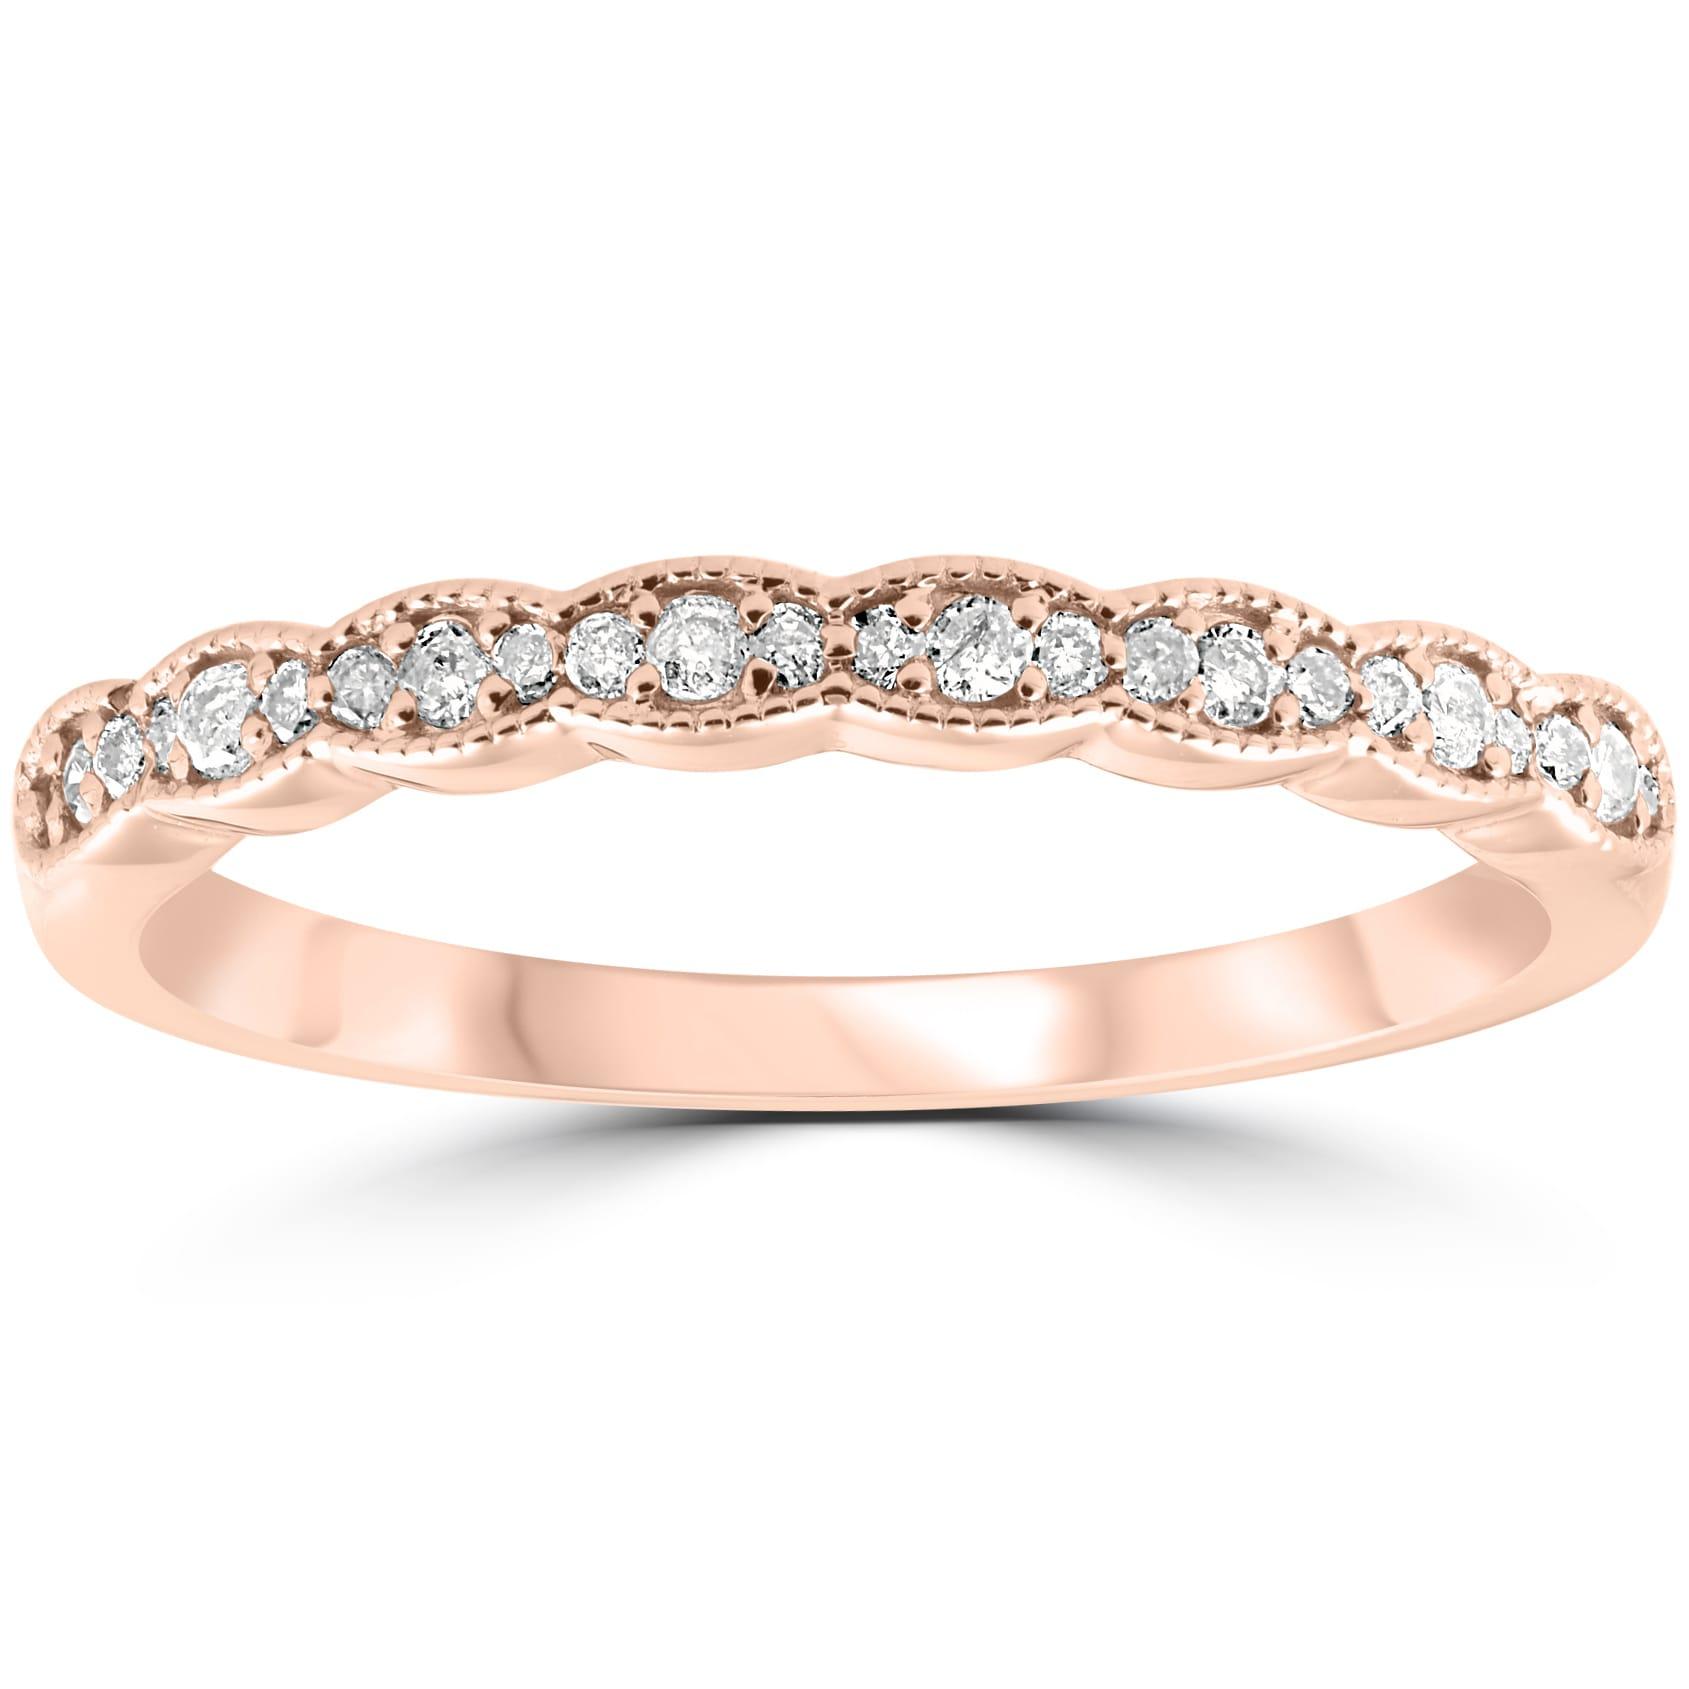 Shop Bliss 14k Rose Gold 1 5ct Tdw Diamond Stackable Wedding Ring